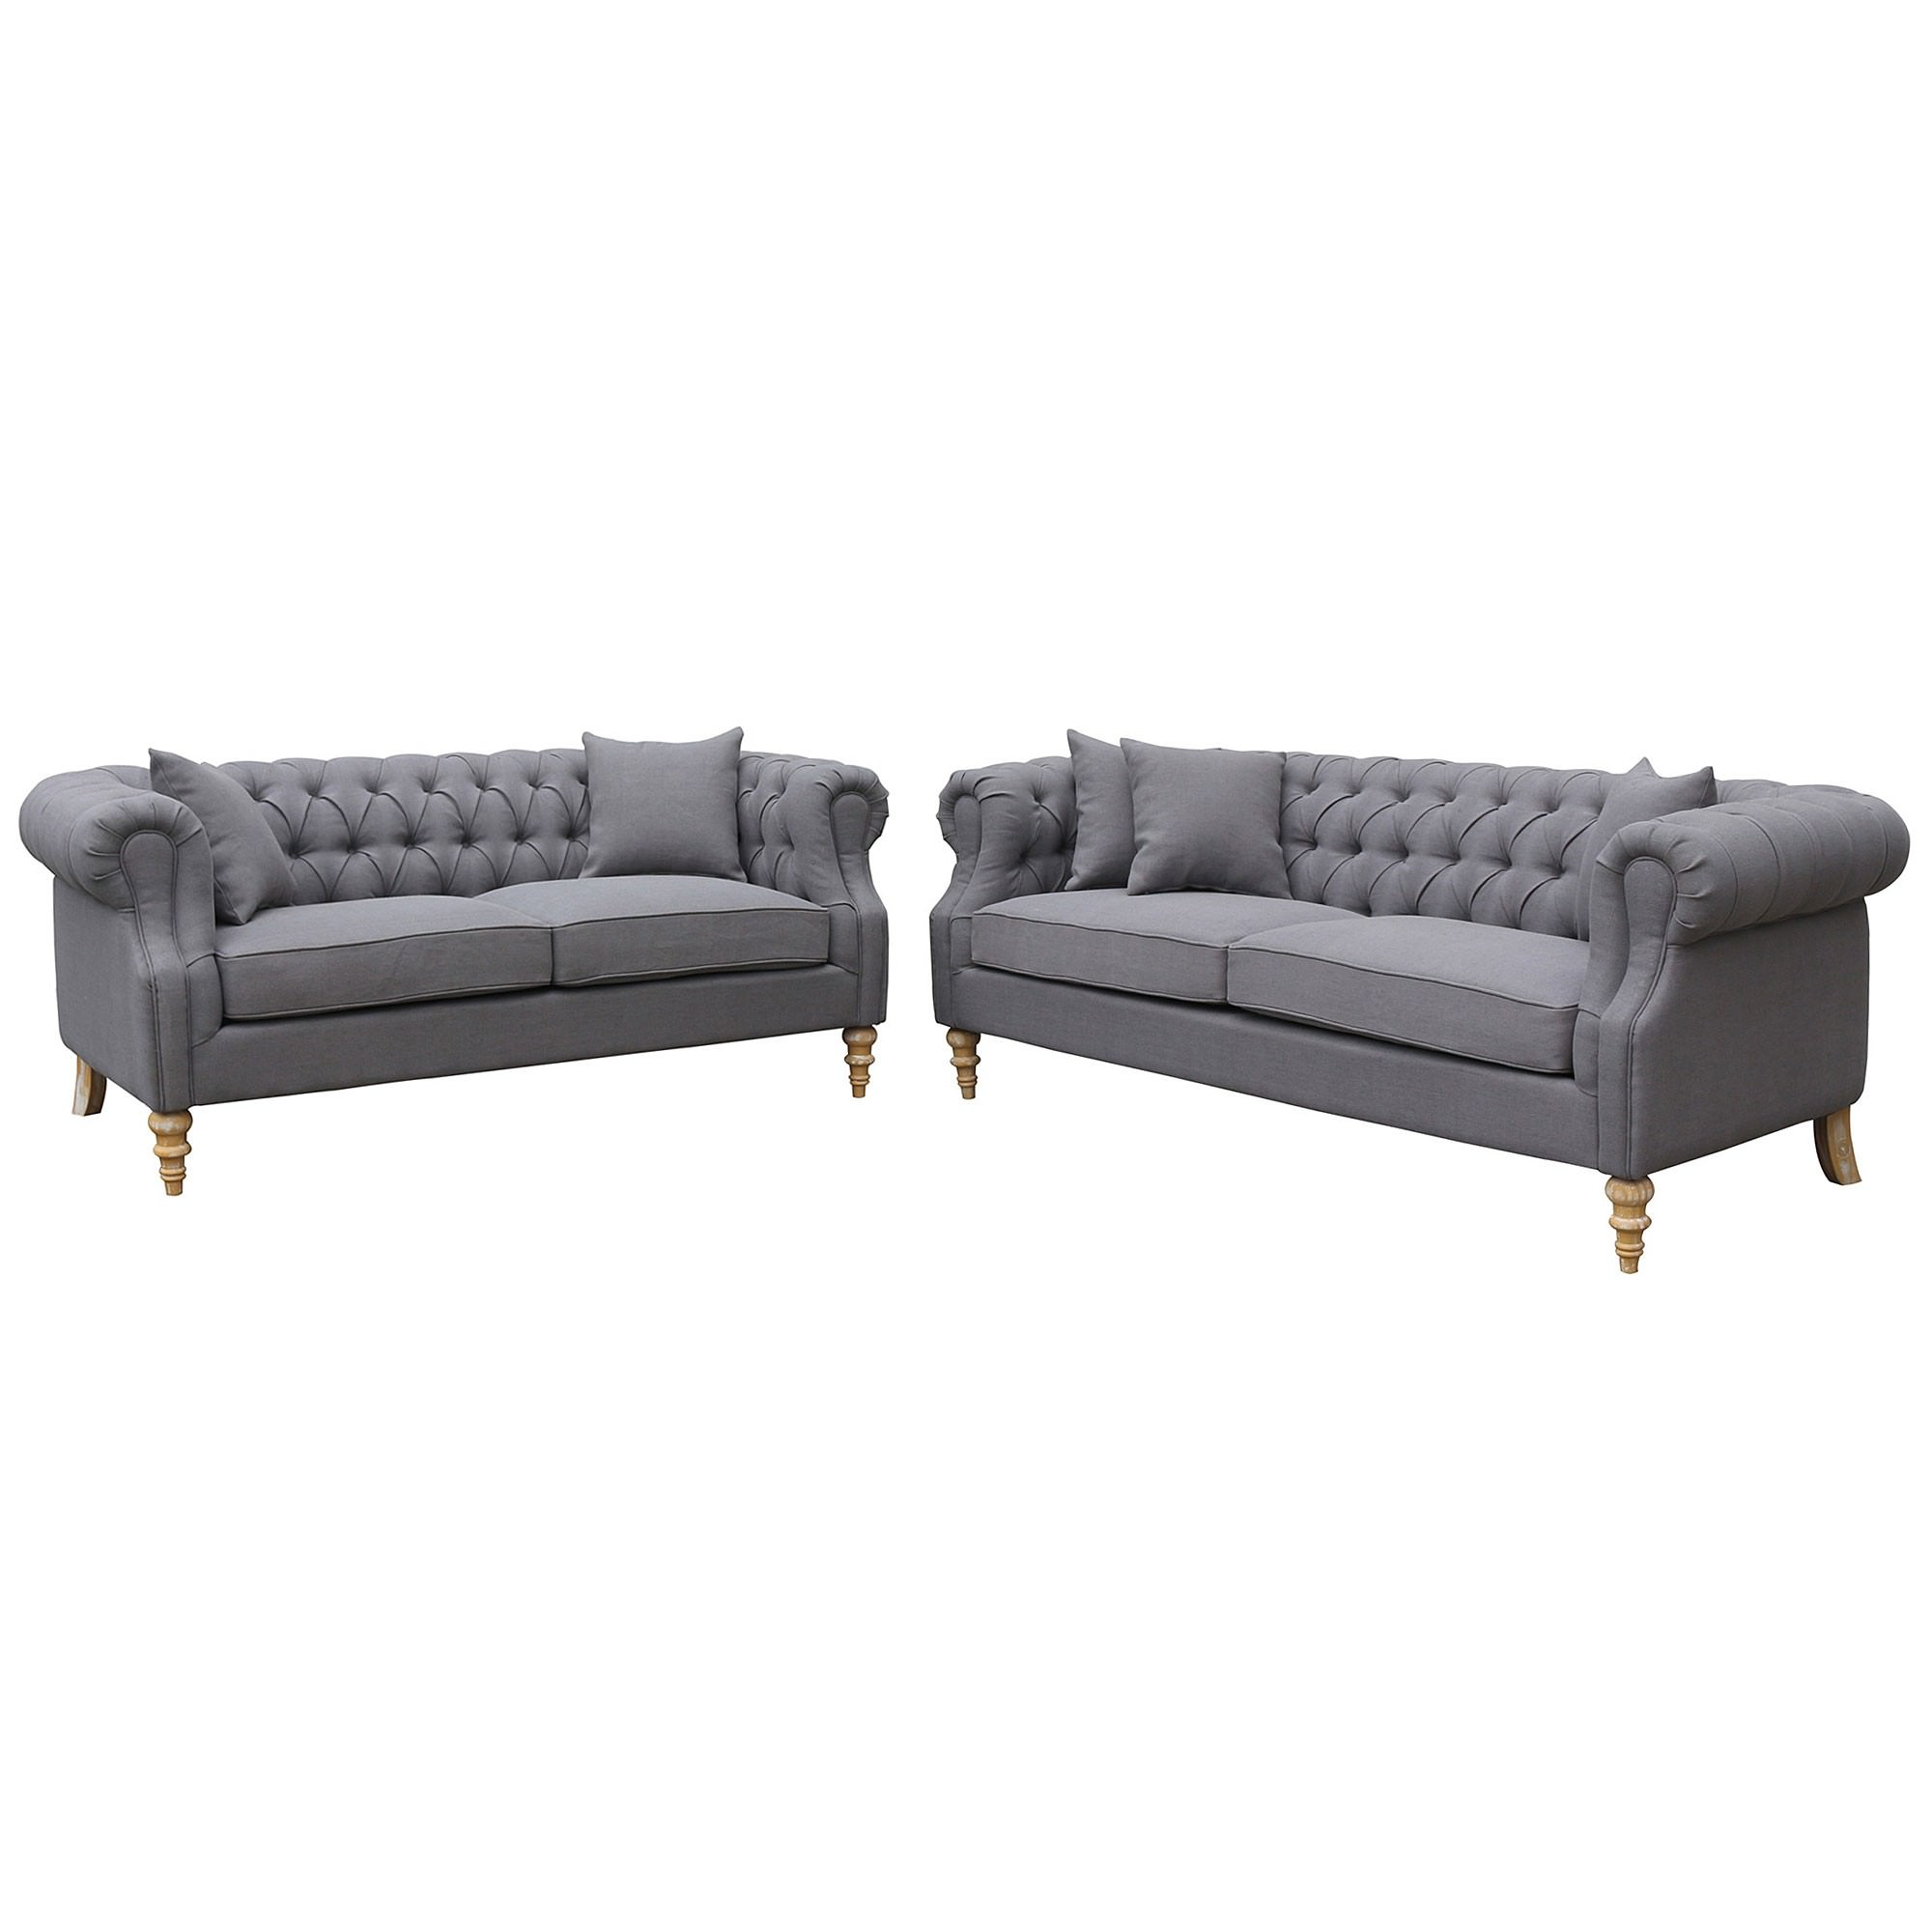 Lithia 3 2 Seater Fabric Chesterfield Sofa Set